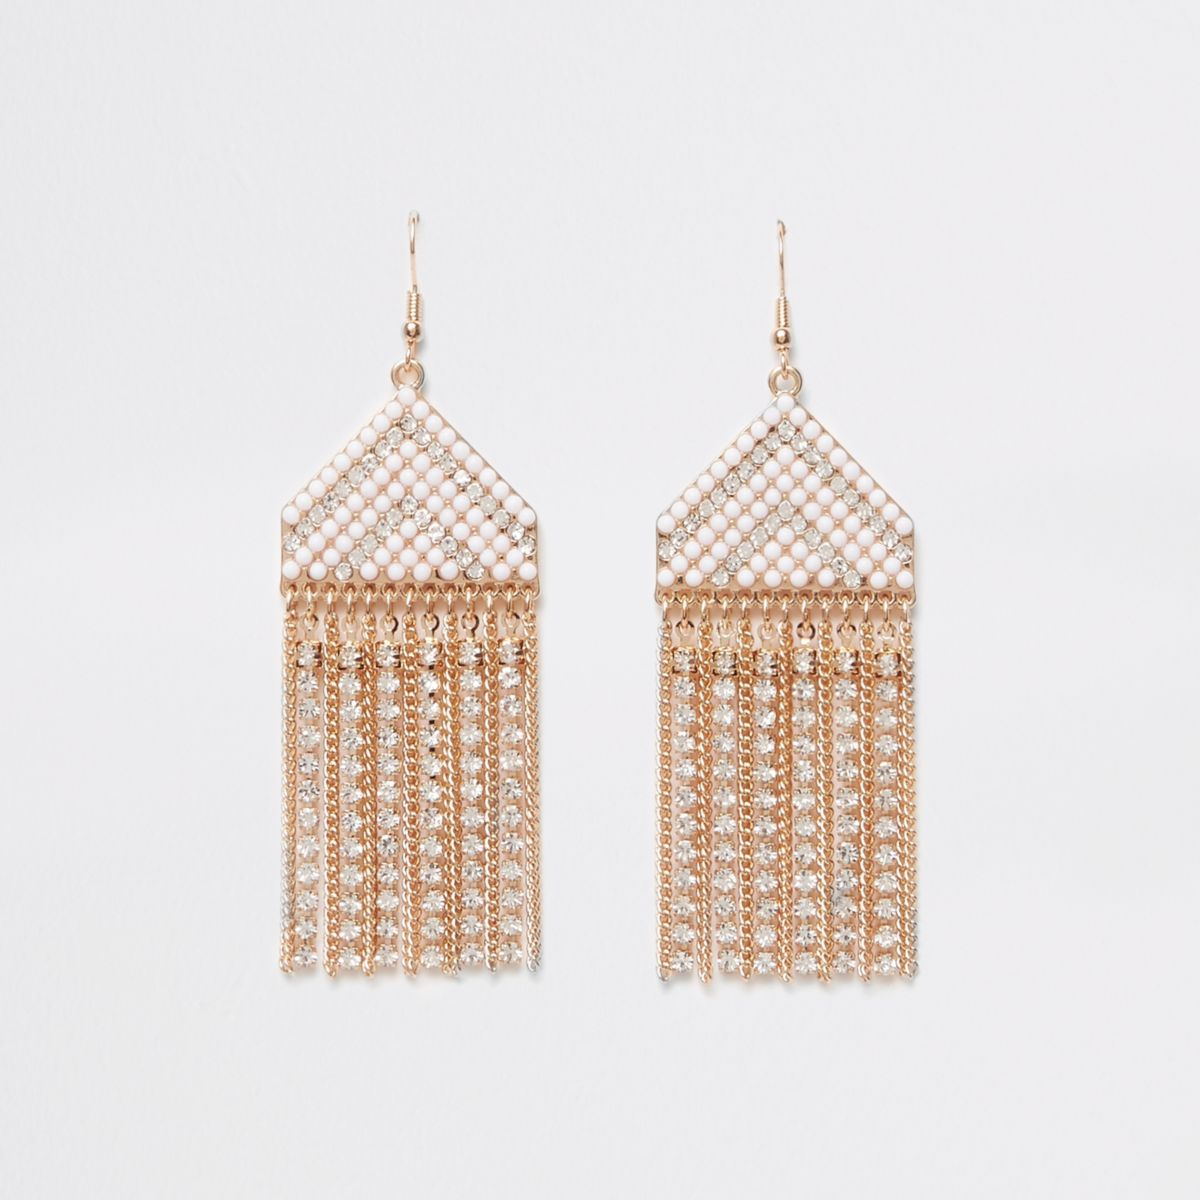 Gold tone seadbead drop earrings